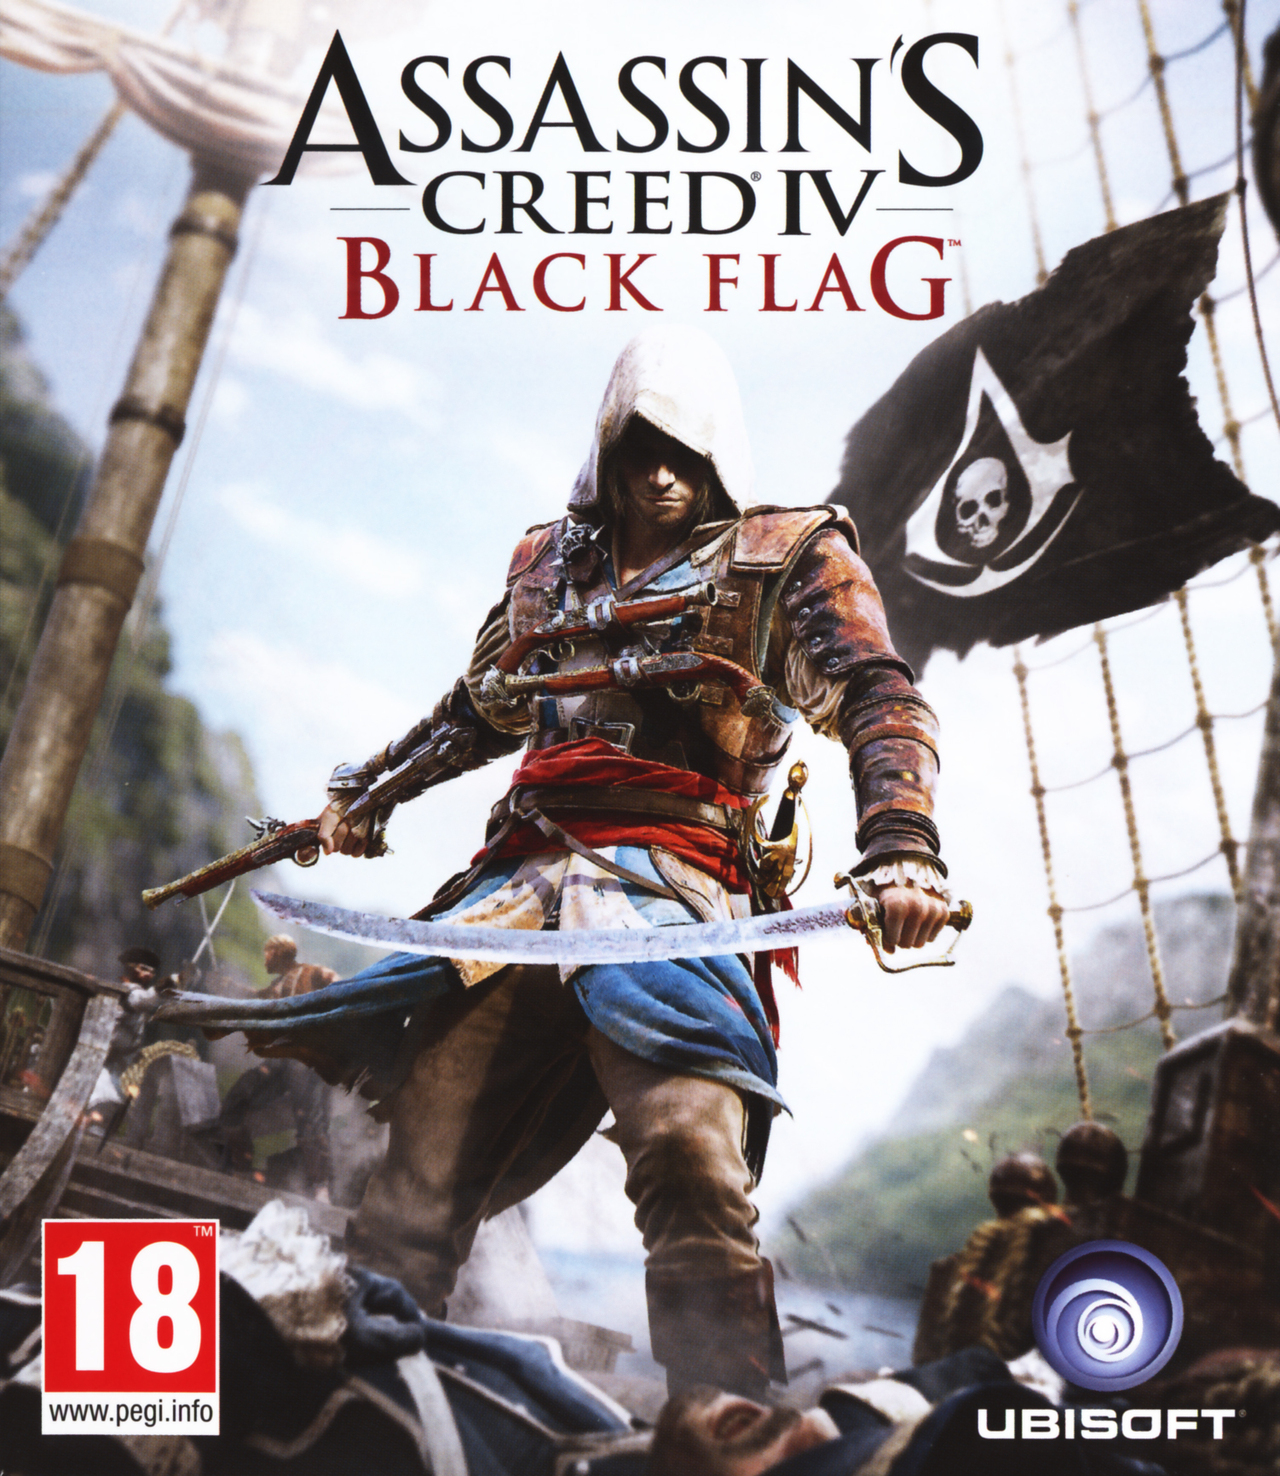 Assassin's Creed IV : Black Flag sur Xbox One - jeuxvideo.com